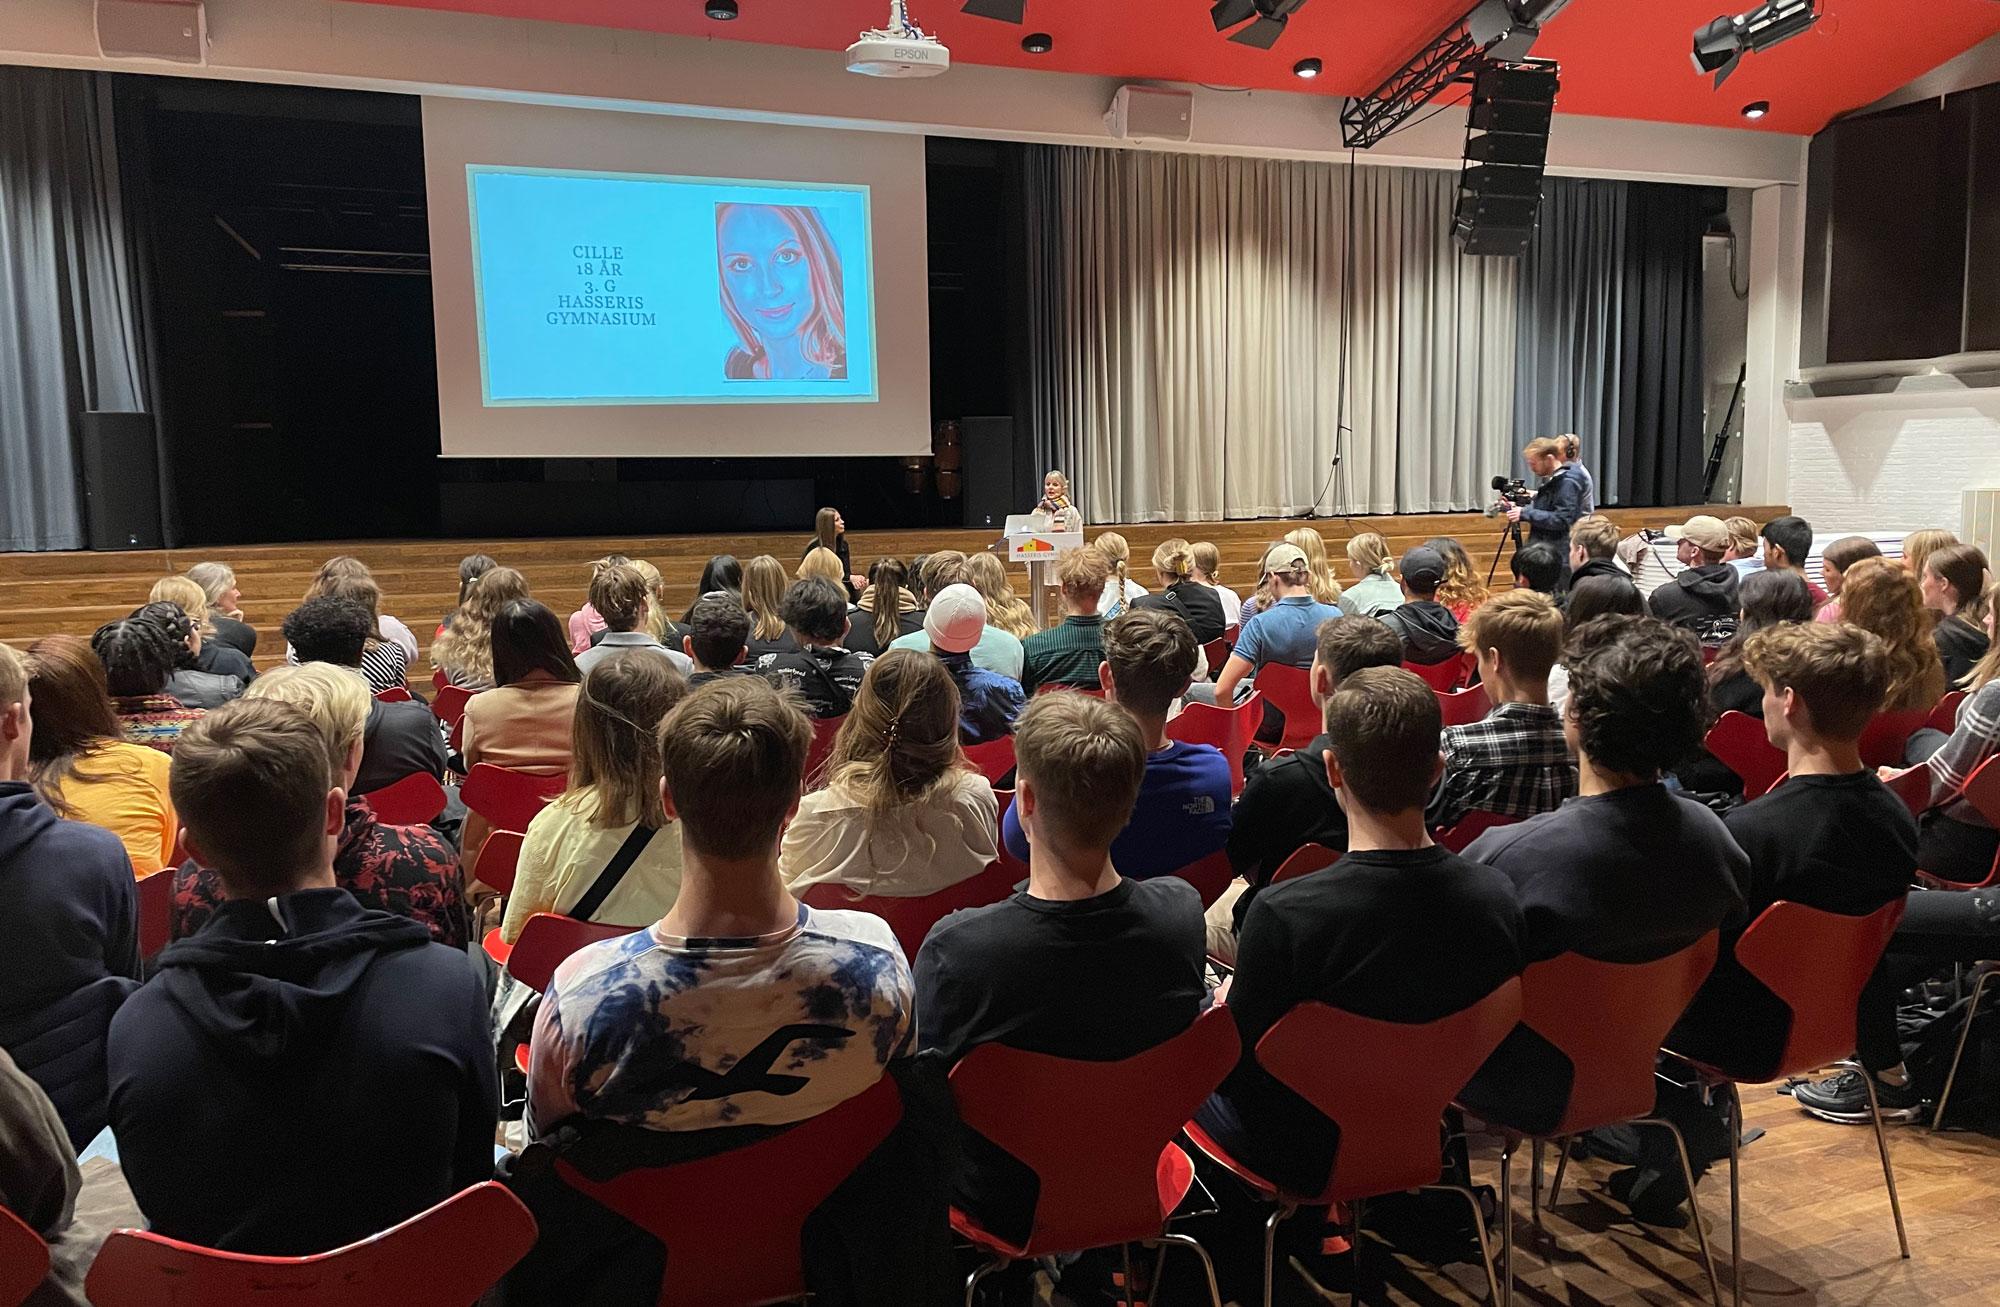 Husker du drabet på Hasseris Gymnasium?: Ny podcast dykker ned i historien